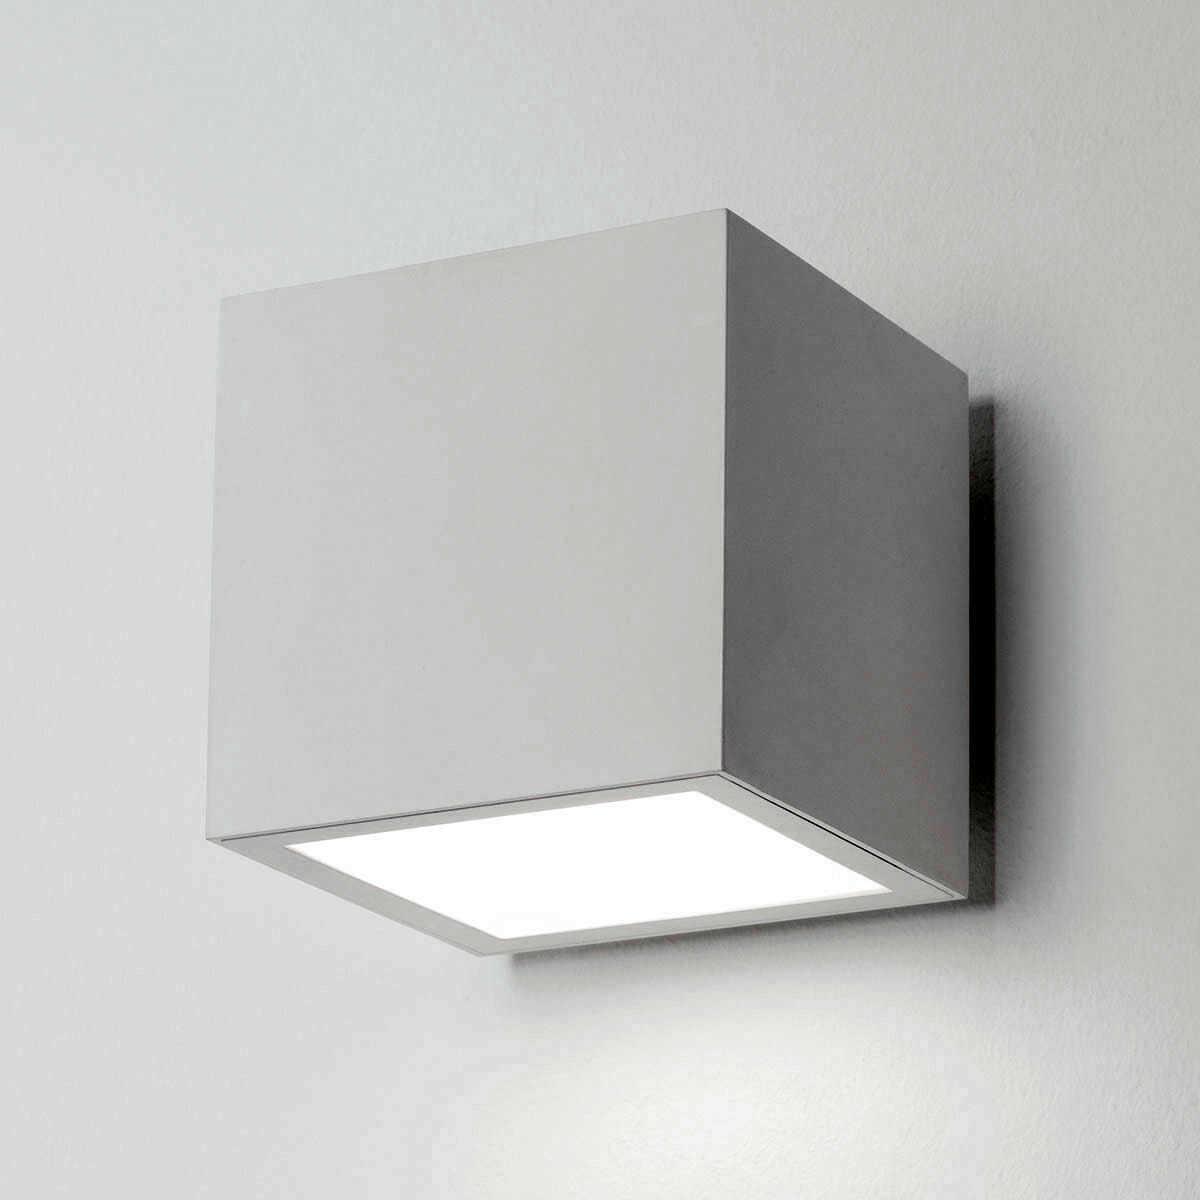 Lampada a parete faretto led ek cubo 120f pa - Applique da esterno ikea ...